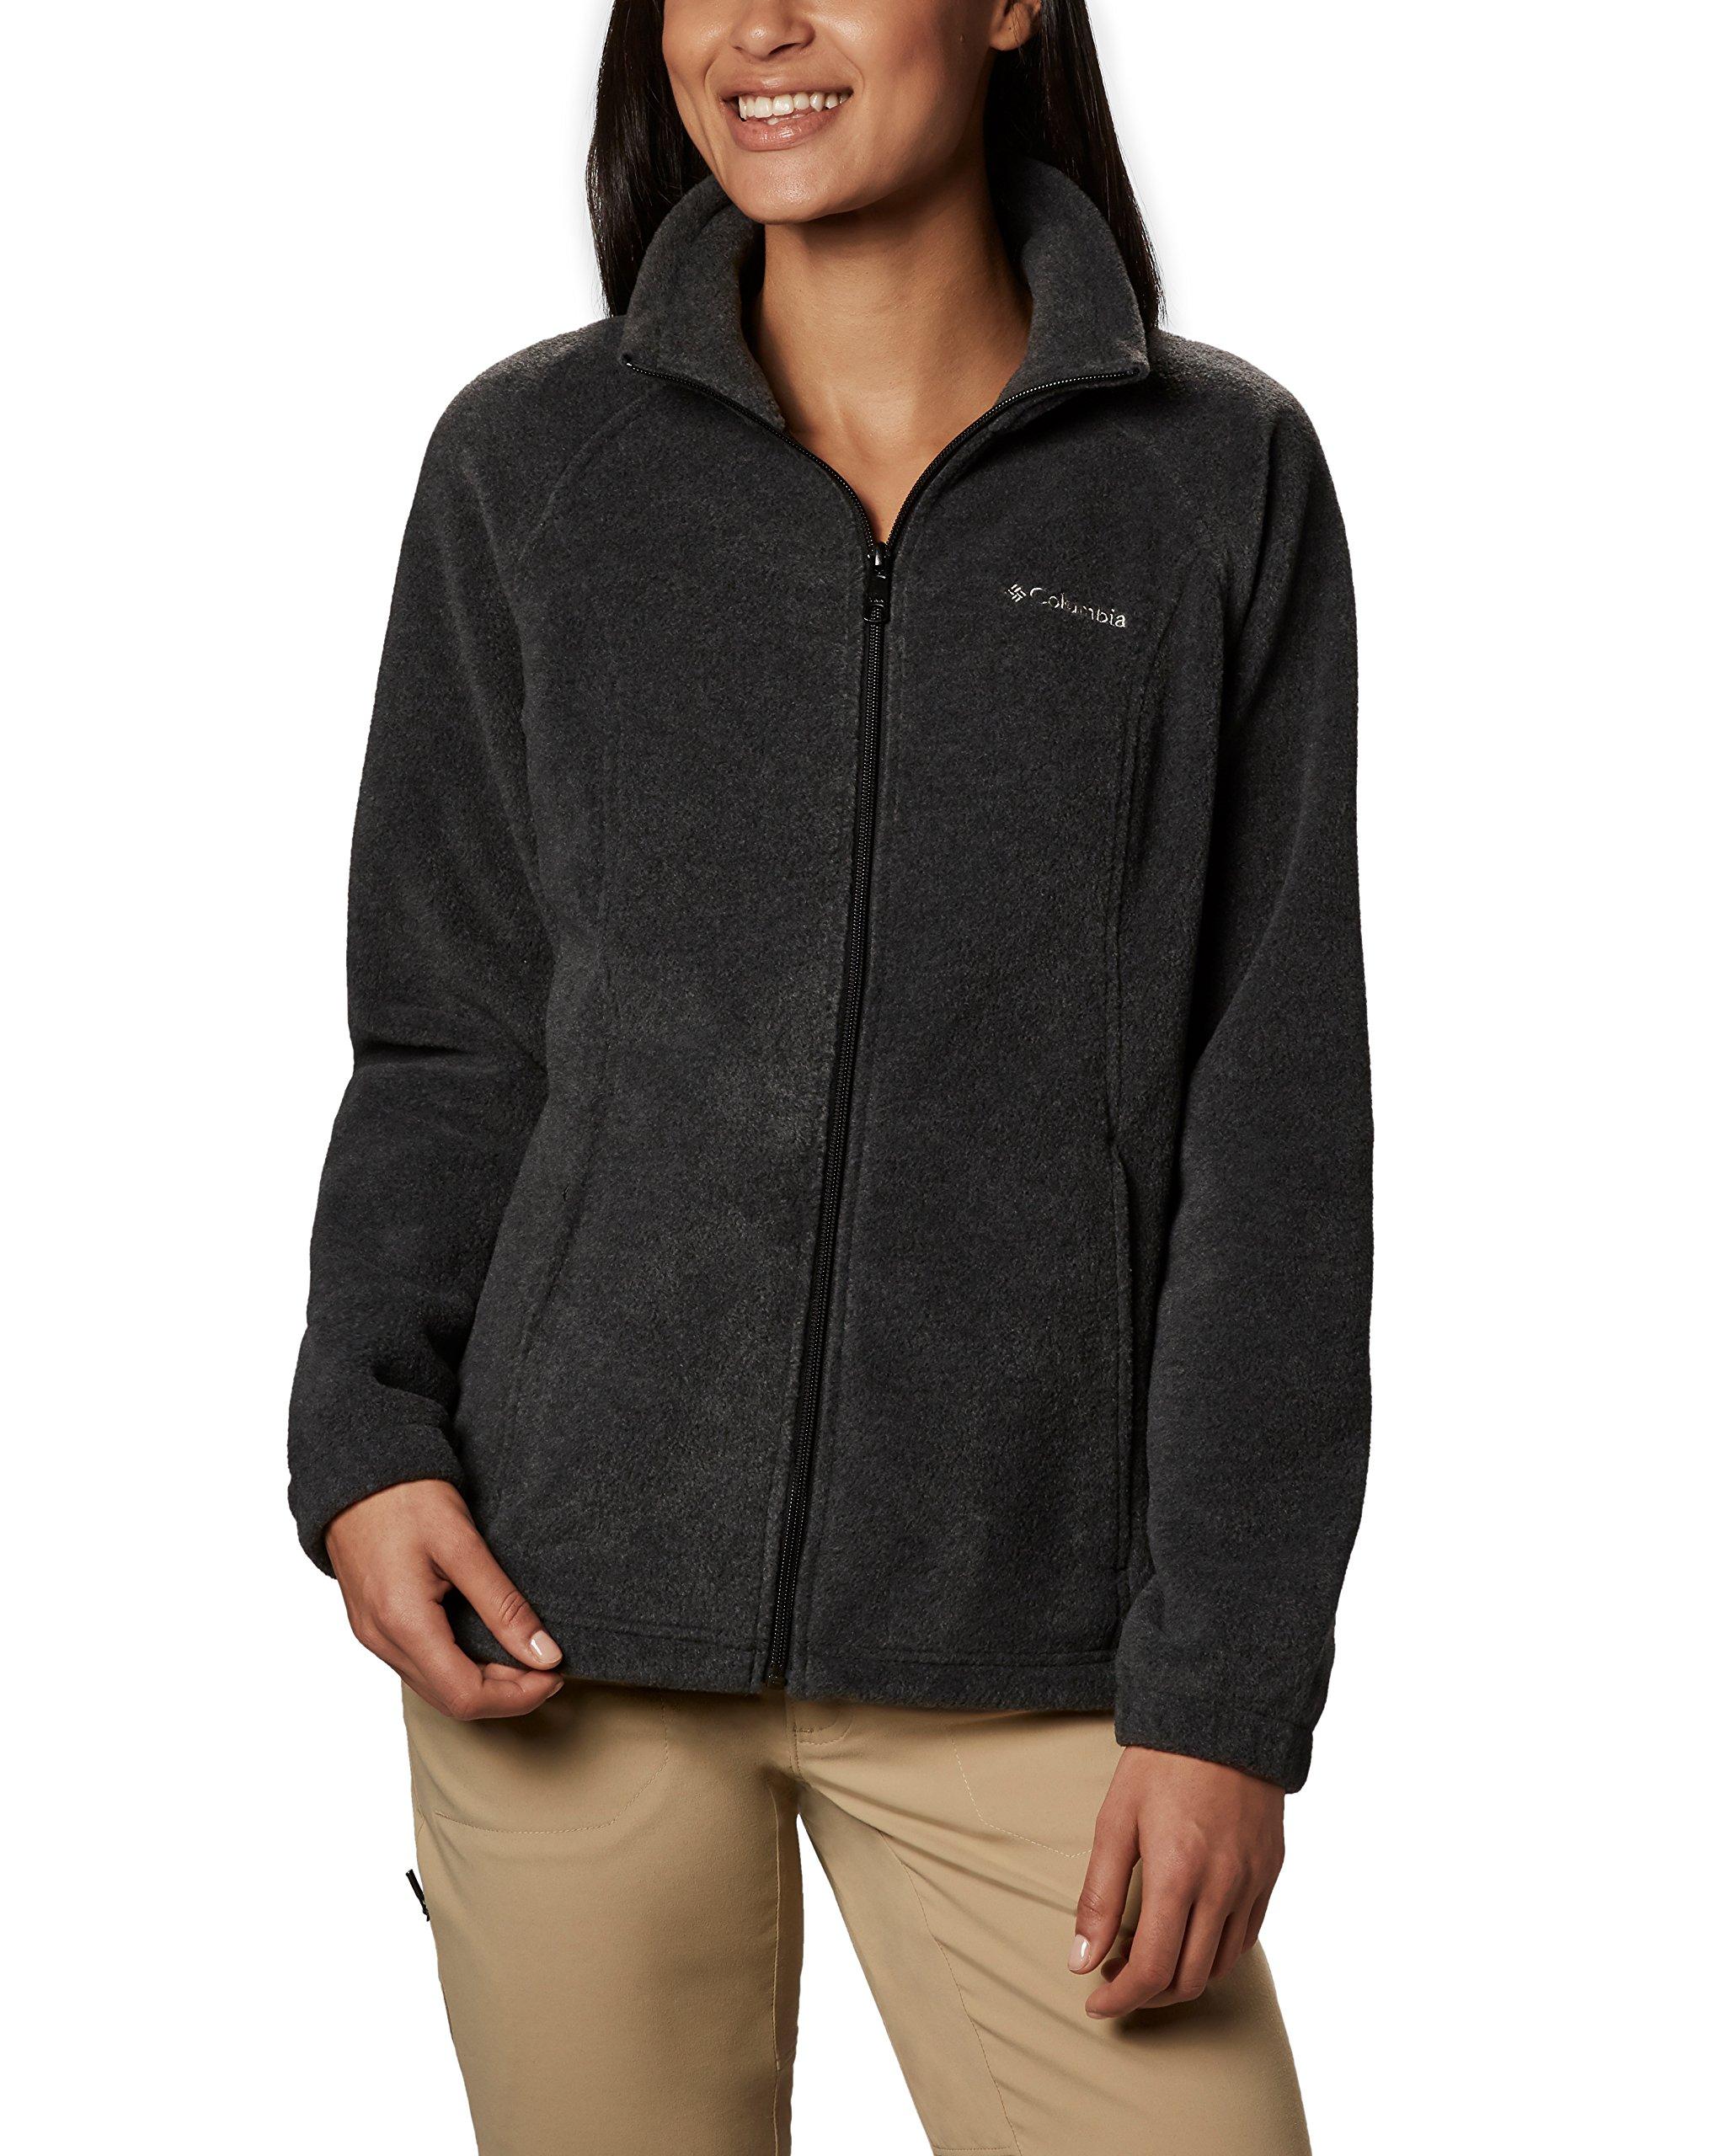 Columbia Women's Benton Springs Classic Fit Full Zip Soft Fleece Jacket, charcoal heather, XL by Columbia